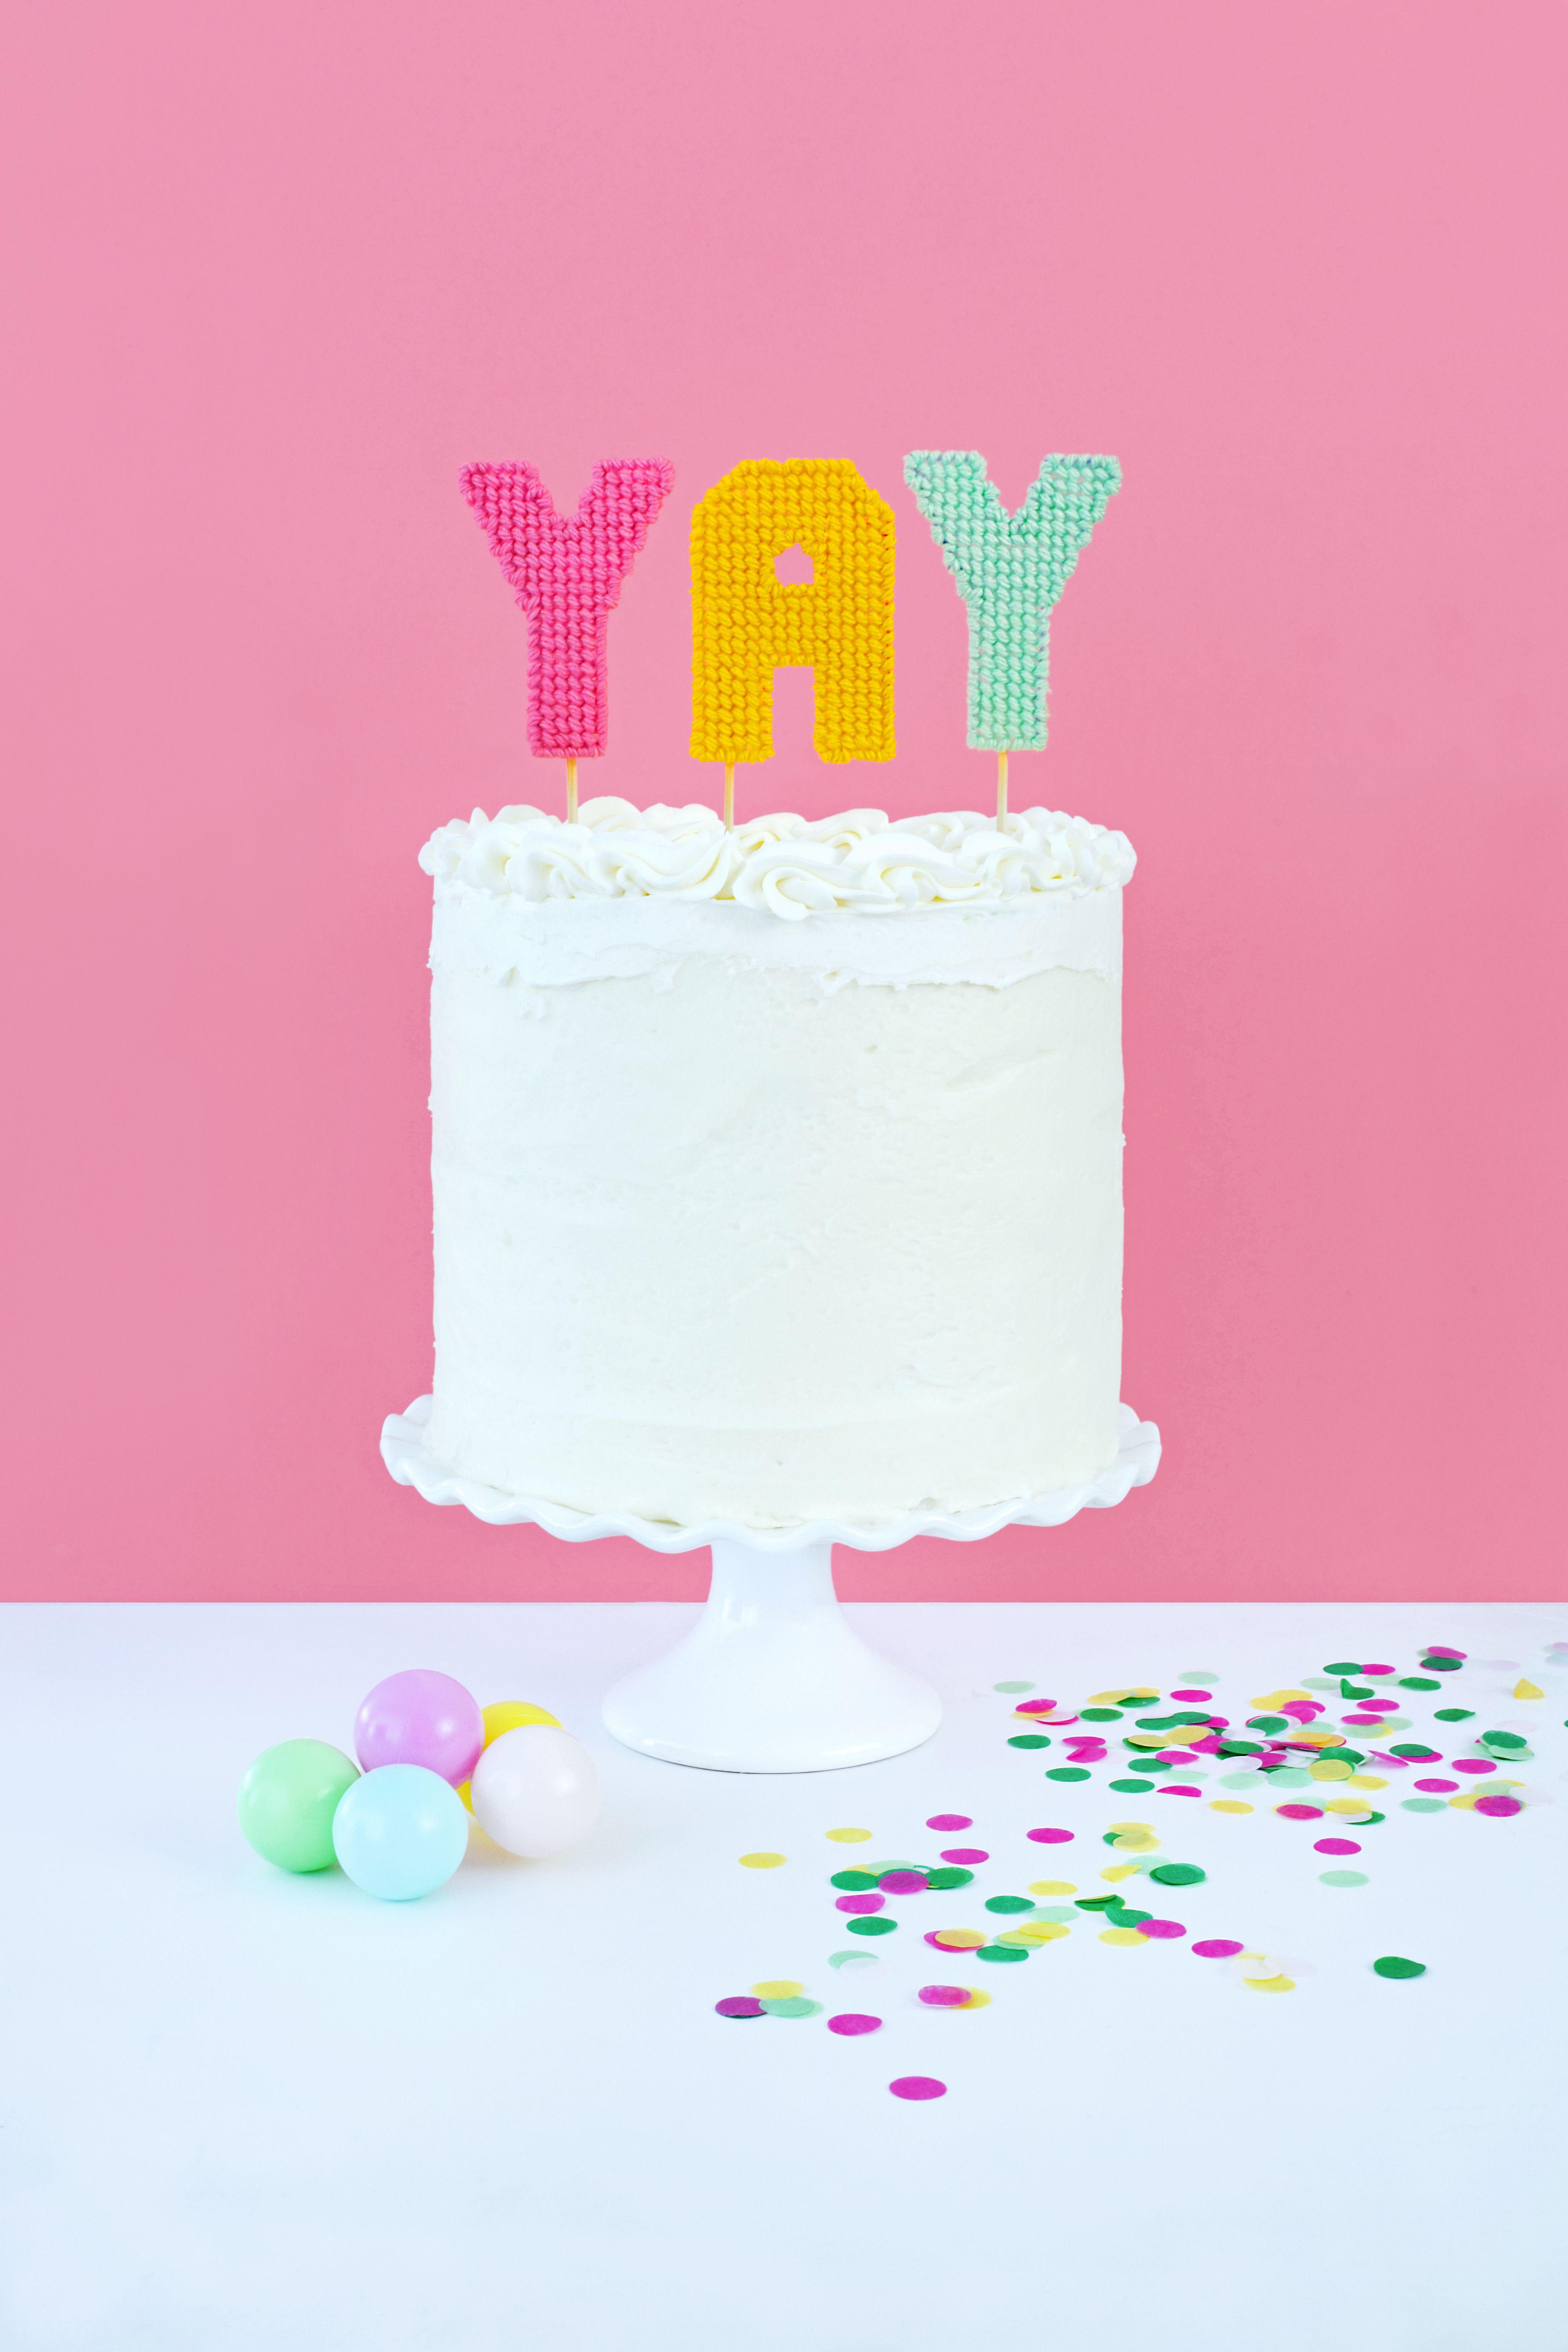 Birthday candle cake diy diy cake topper birthday cake